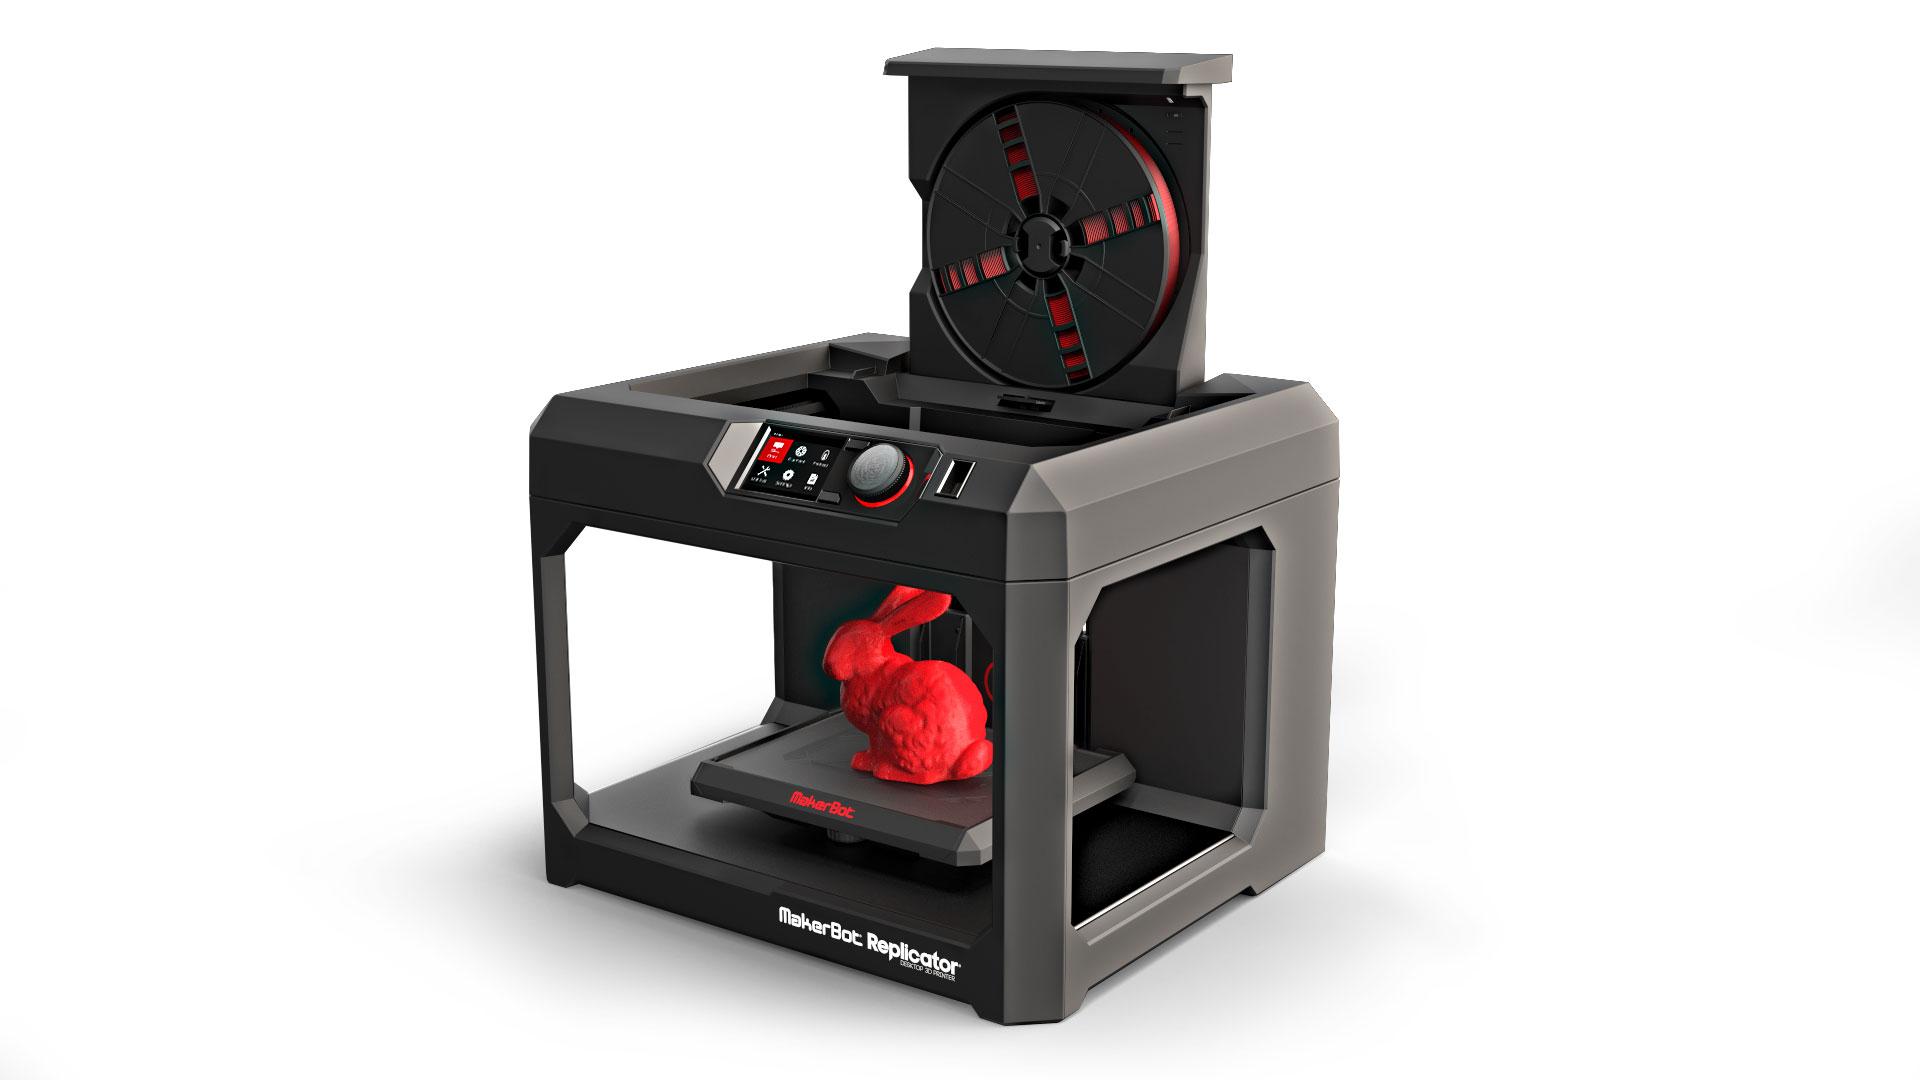 Home Use Replacator D Printer